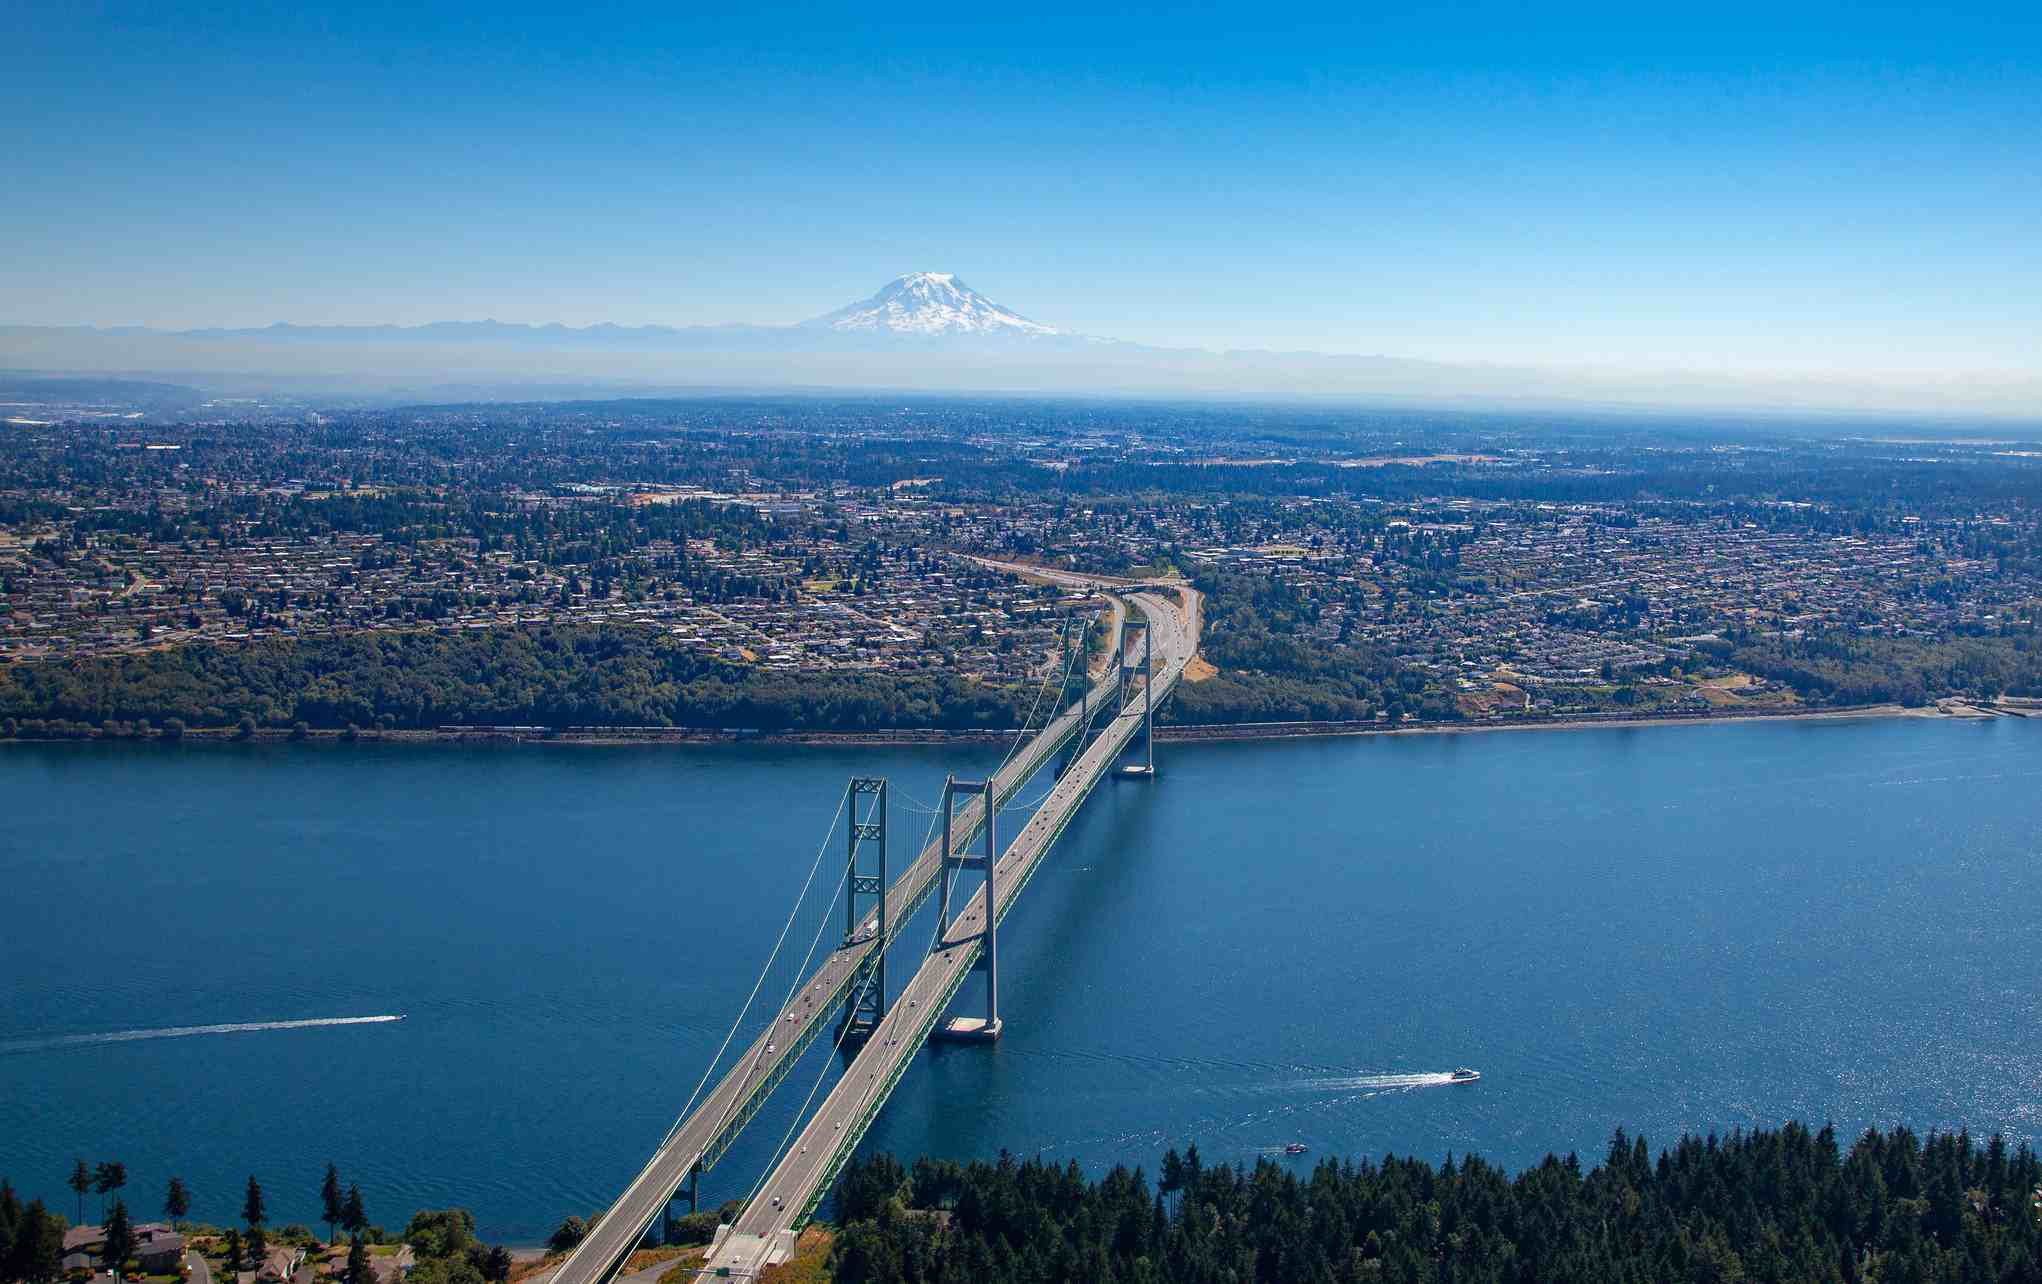 Tacoma Narrows Bridge and boats